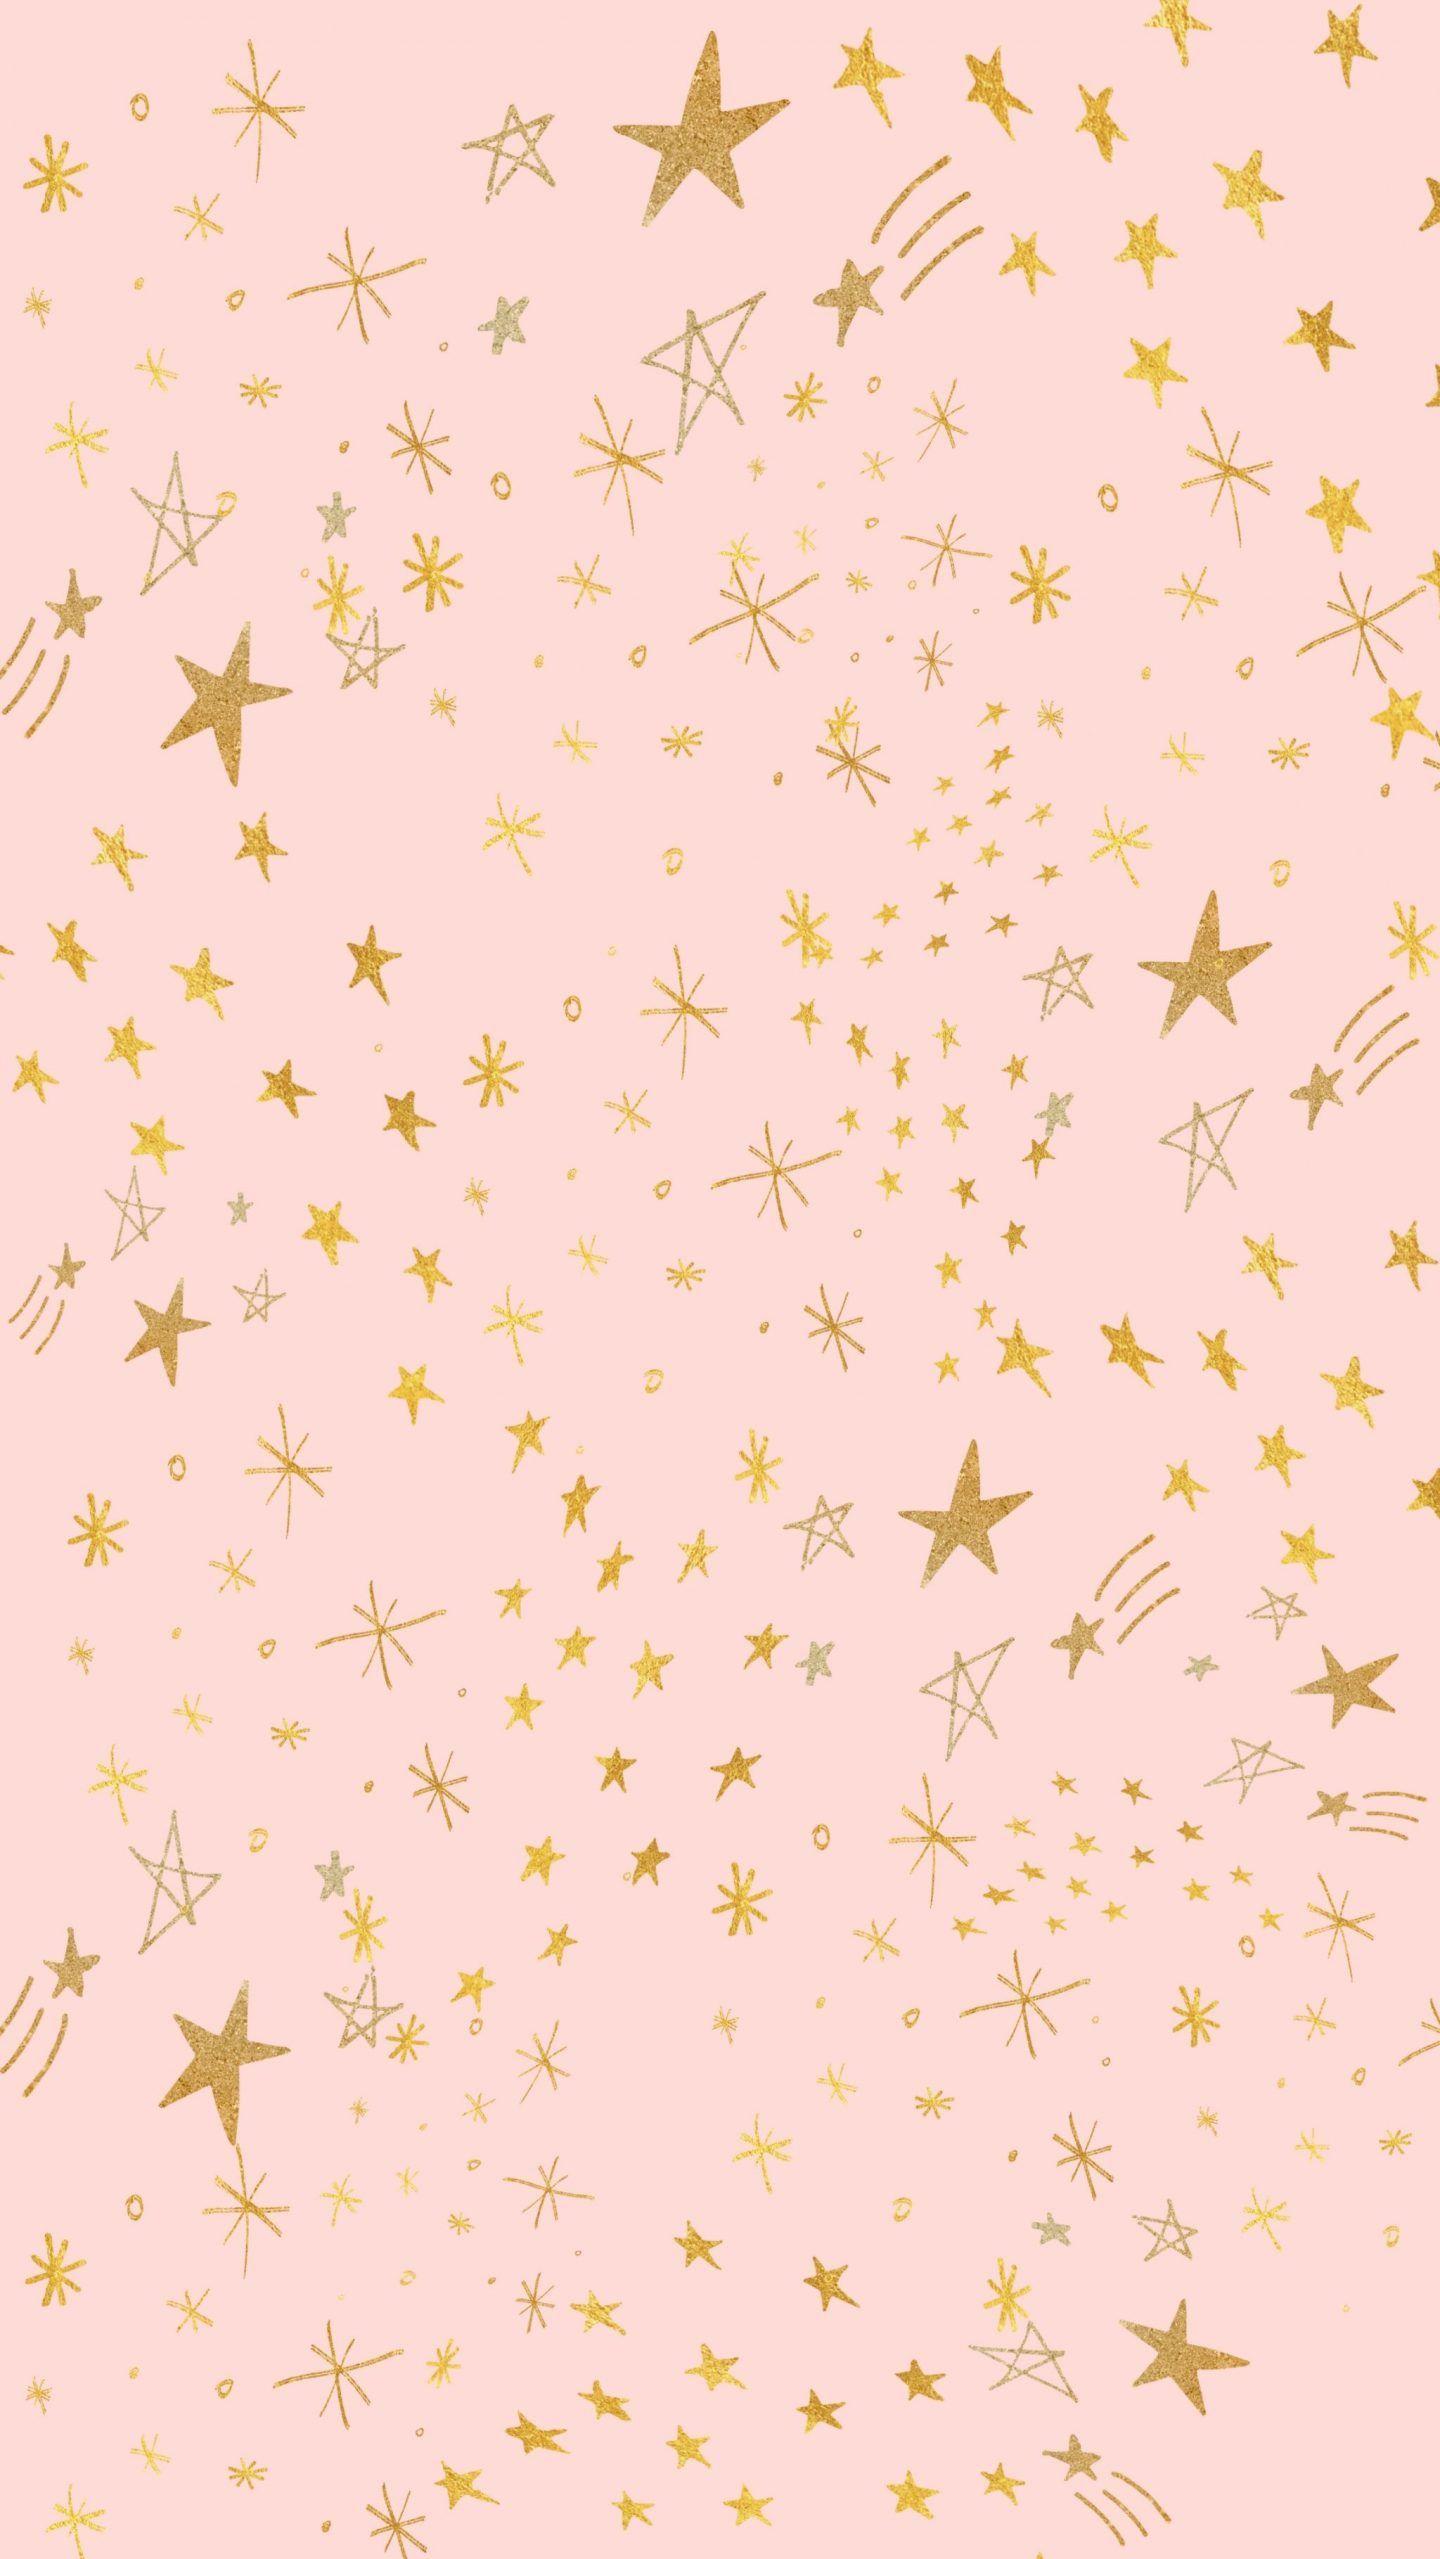 Free Christmas Phone Wallpapers Dizzybrunette